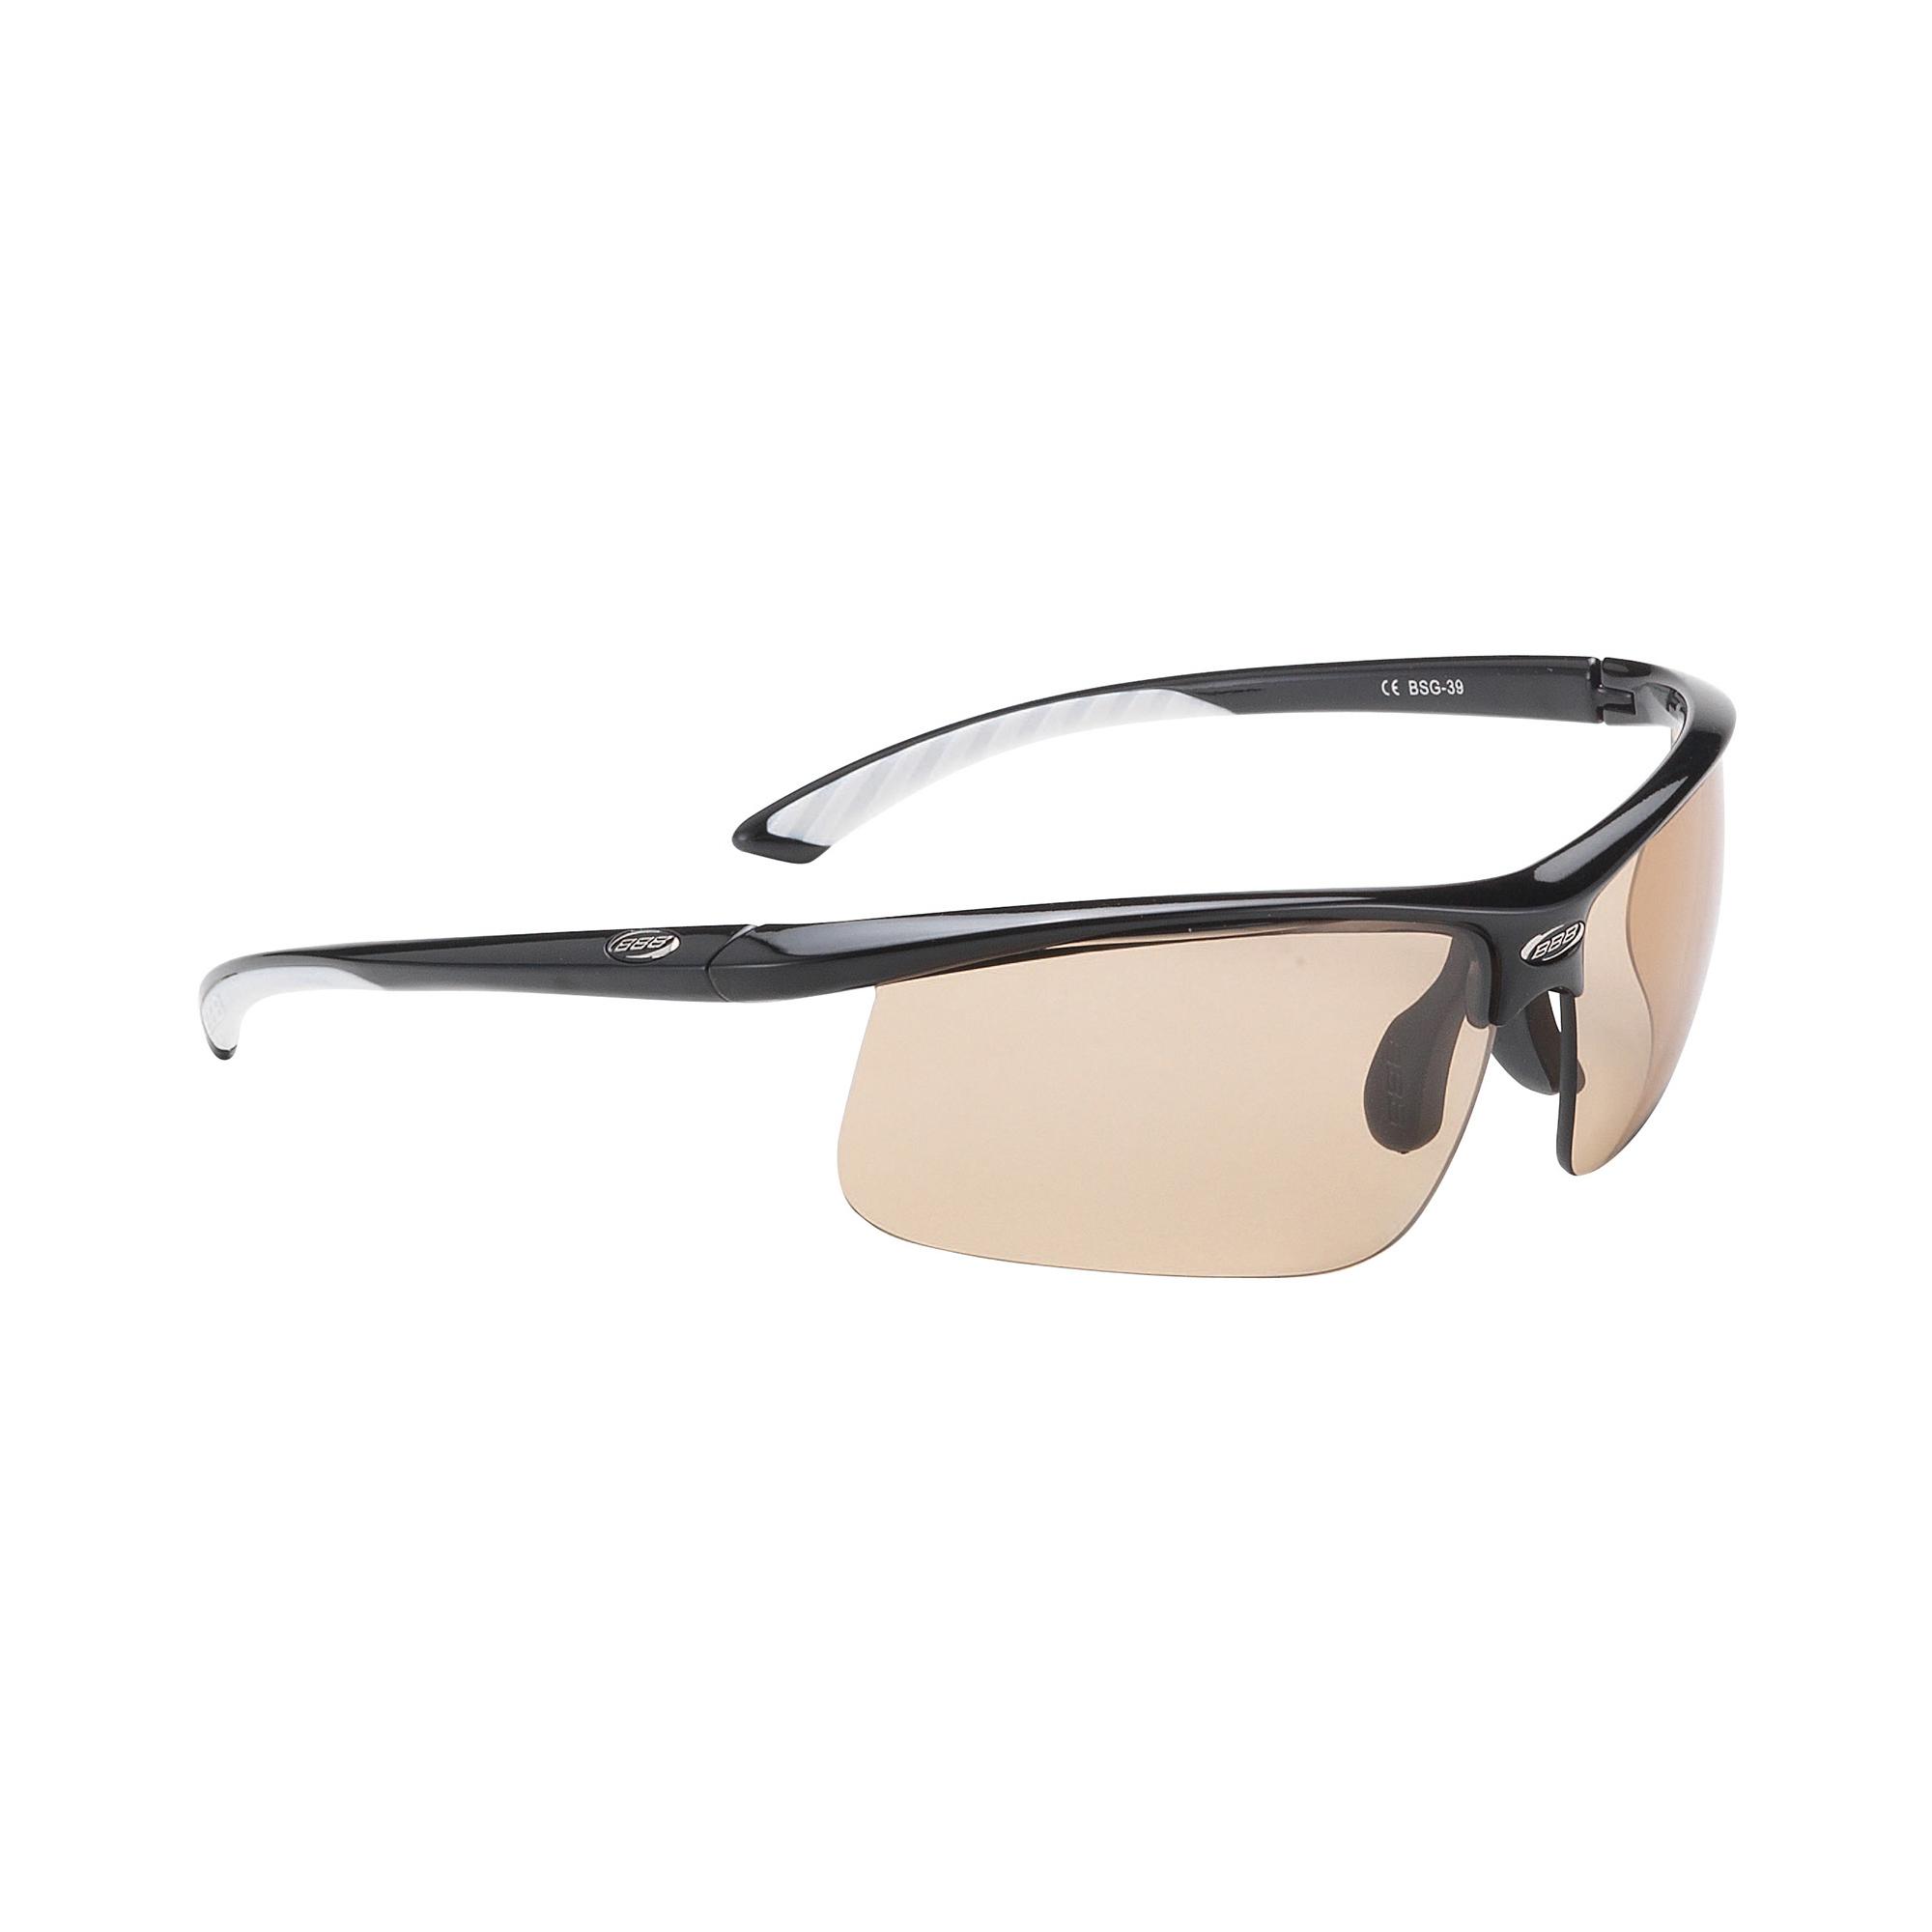 dded20887003 Cheapest Photochromic Sunglasses